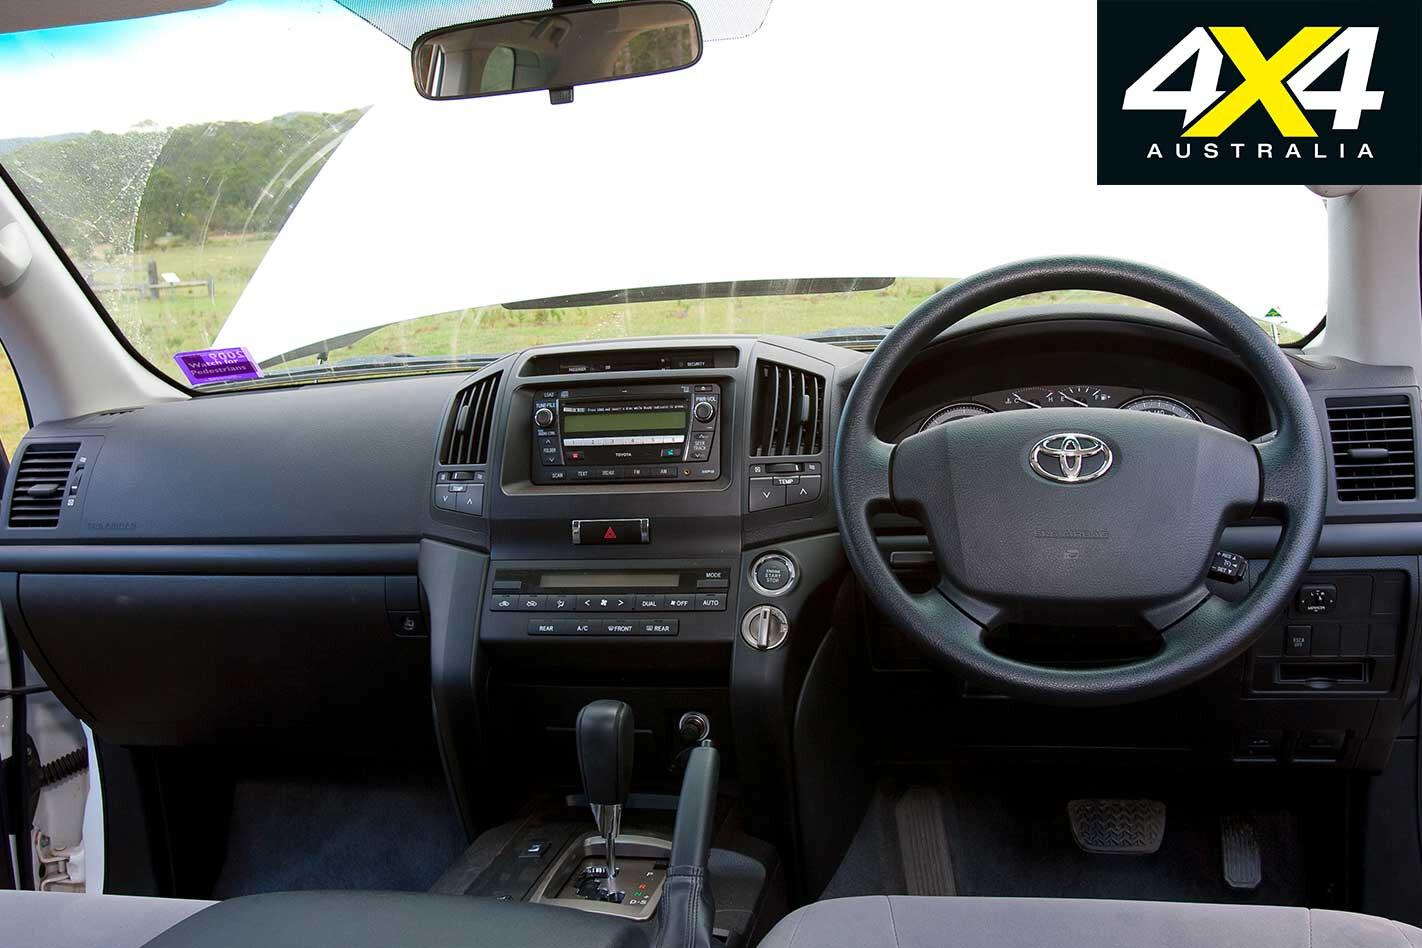 2009 Toyota Land Cruiser 200 Interior Jpg